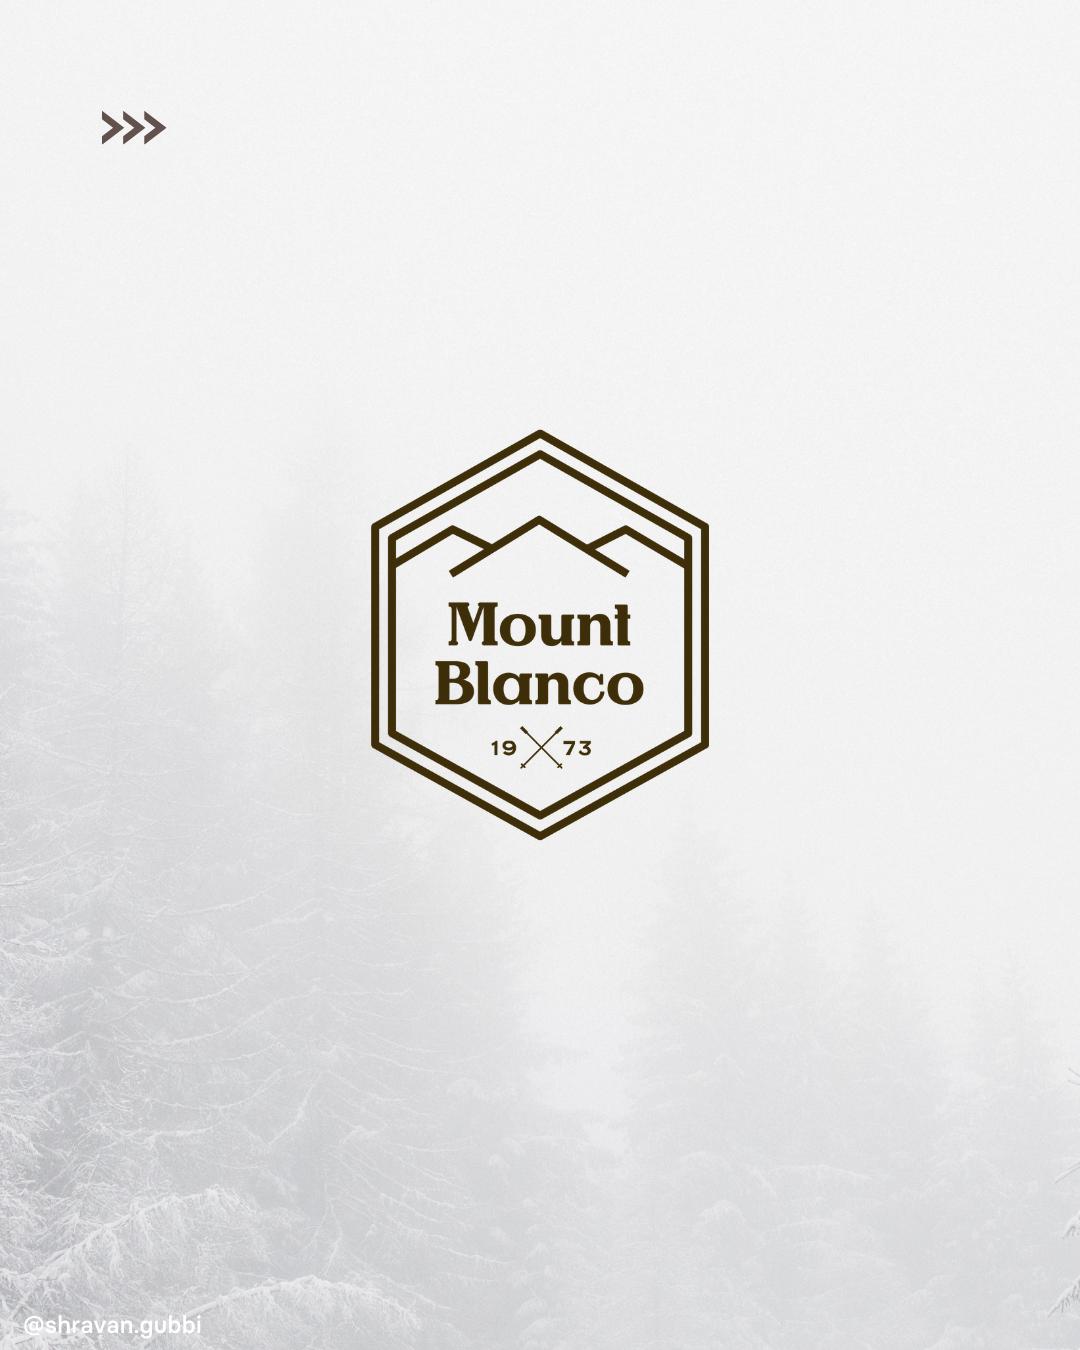 Shravan_gubbi_Mount_Blanco_logo_1